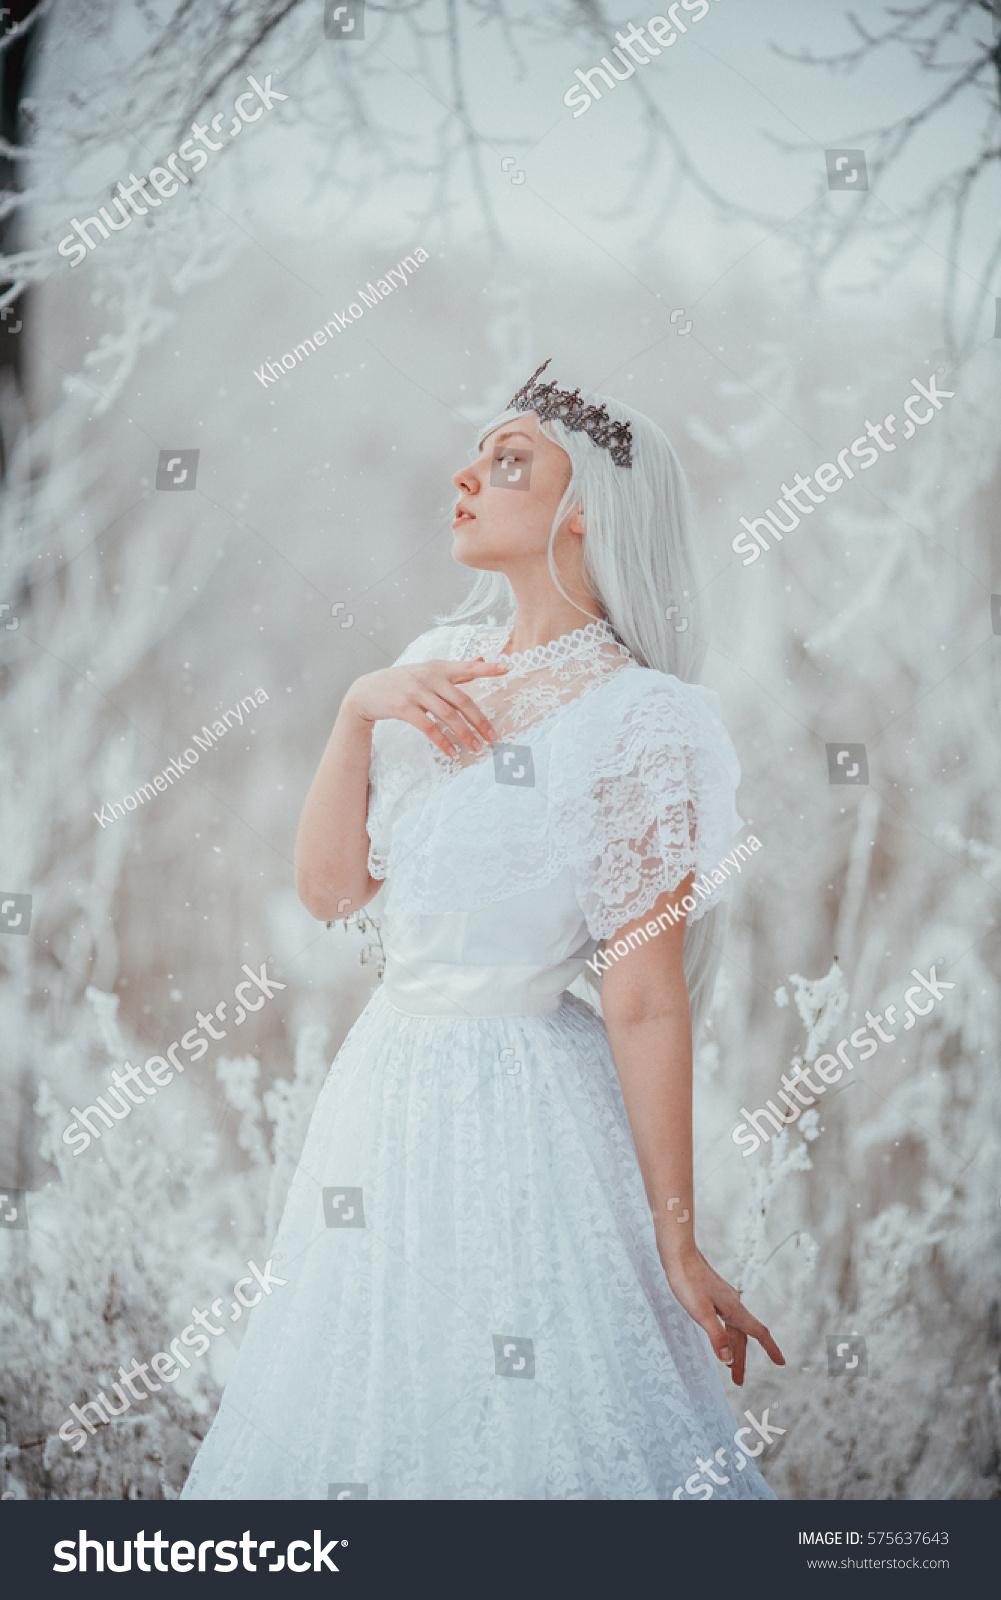 White Fairytale Princess Frozen World Vintage Stock Photo & Image ...